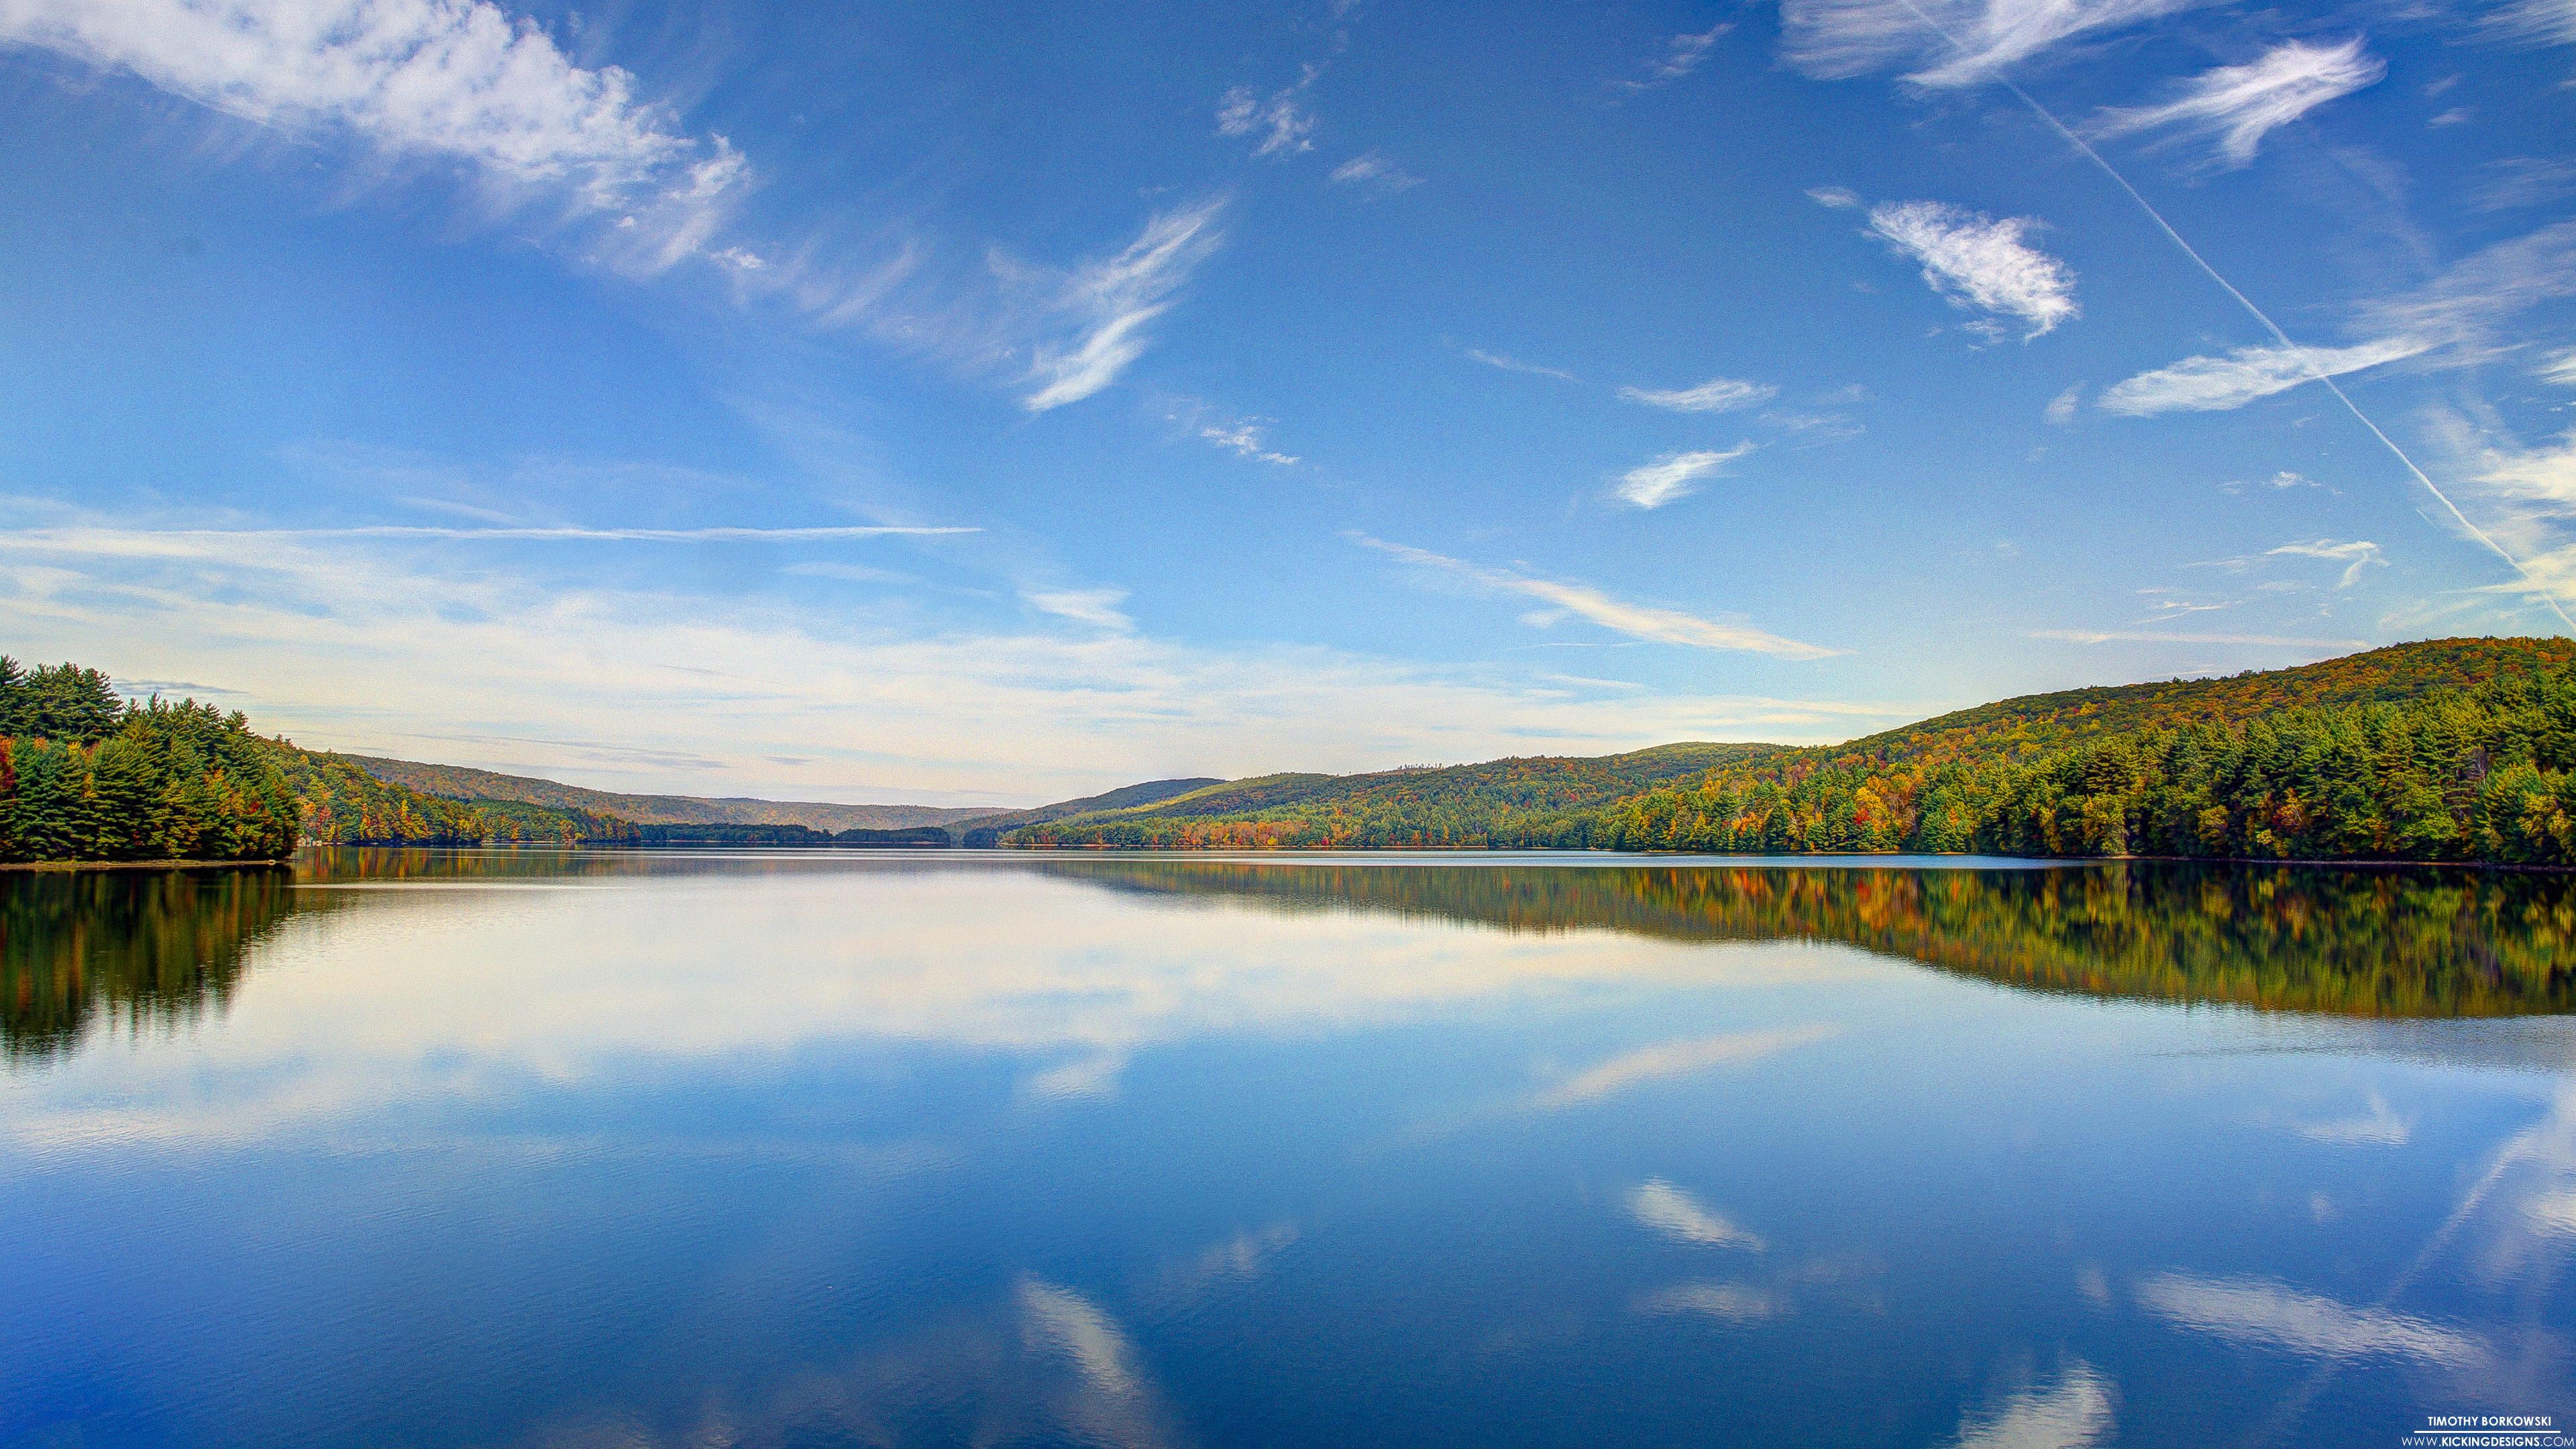 Lake Surrounded 4K Wallpaper Wide Screen Wallpaper 1080p2K4K 3840x2160